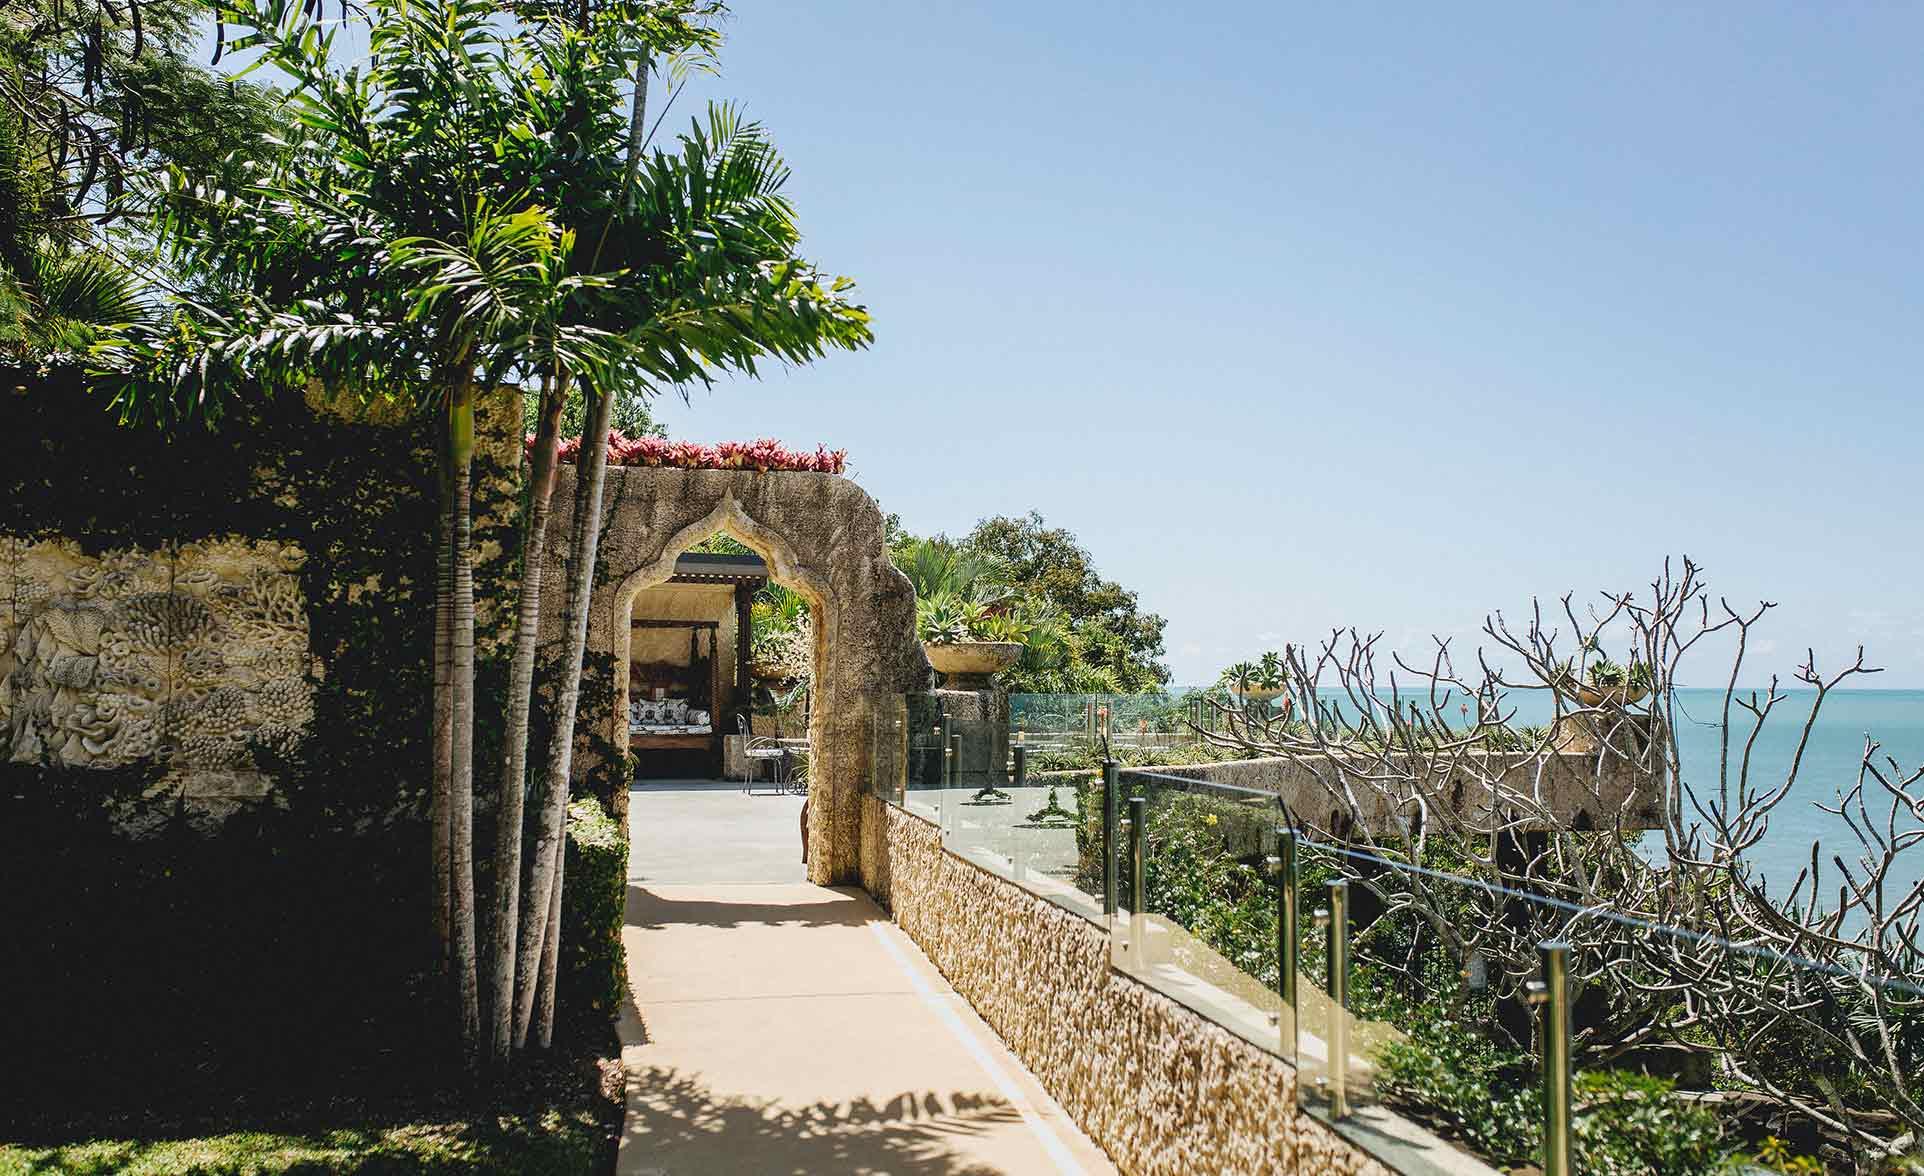 Villa Botanica's ceremony and reception locations